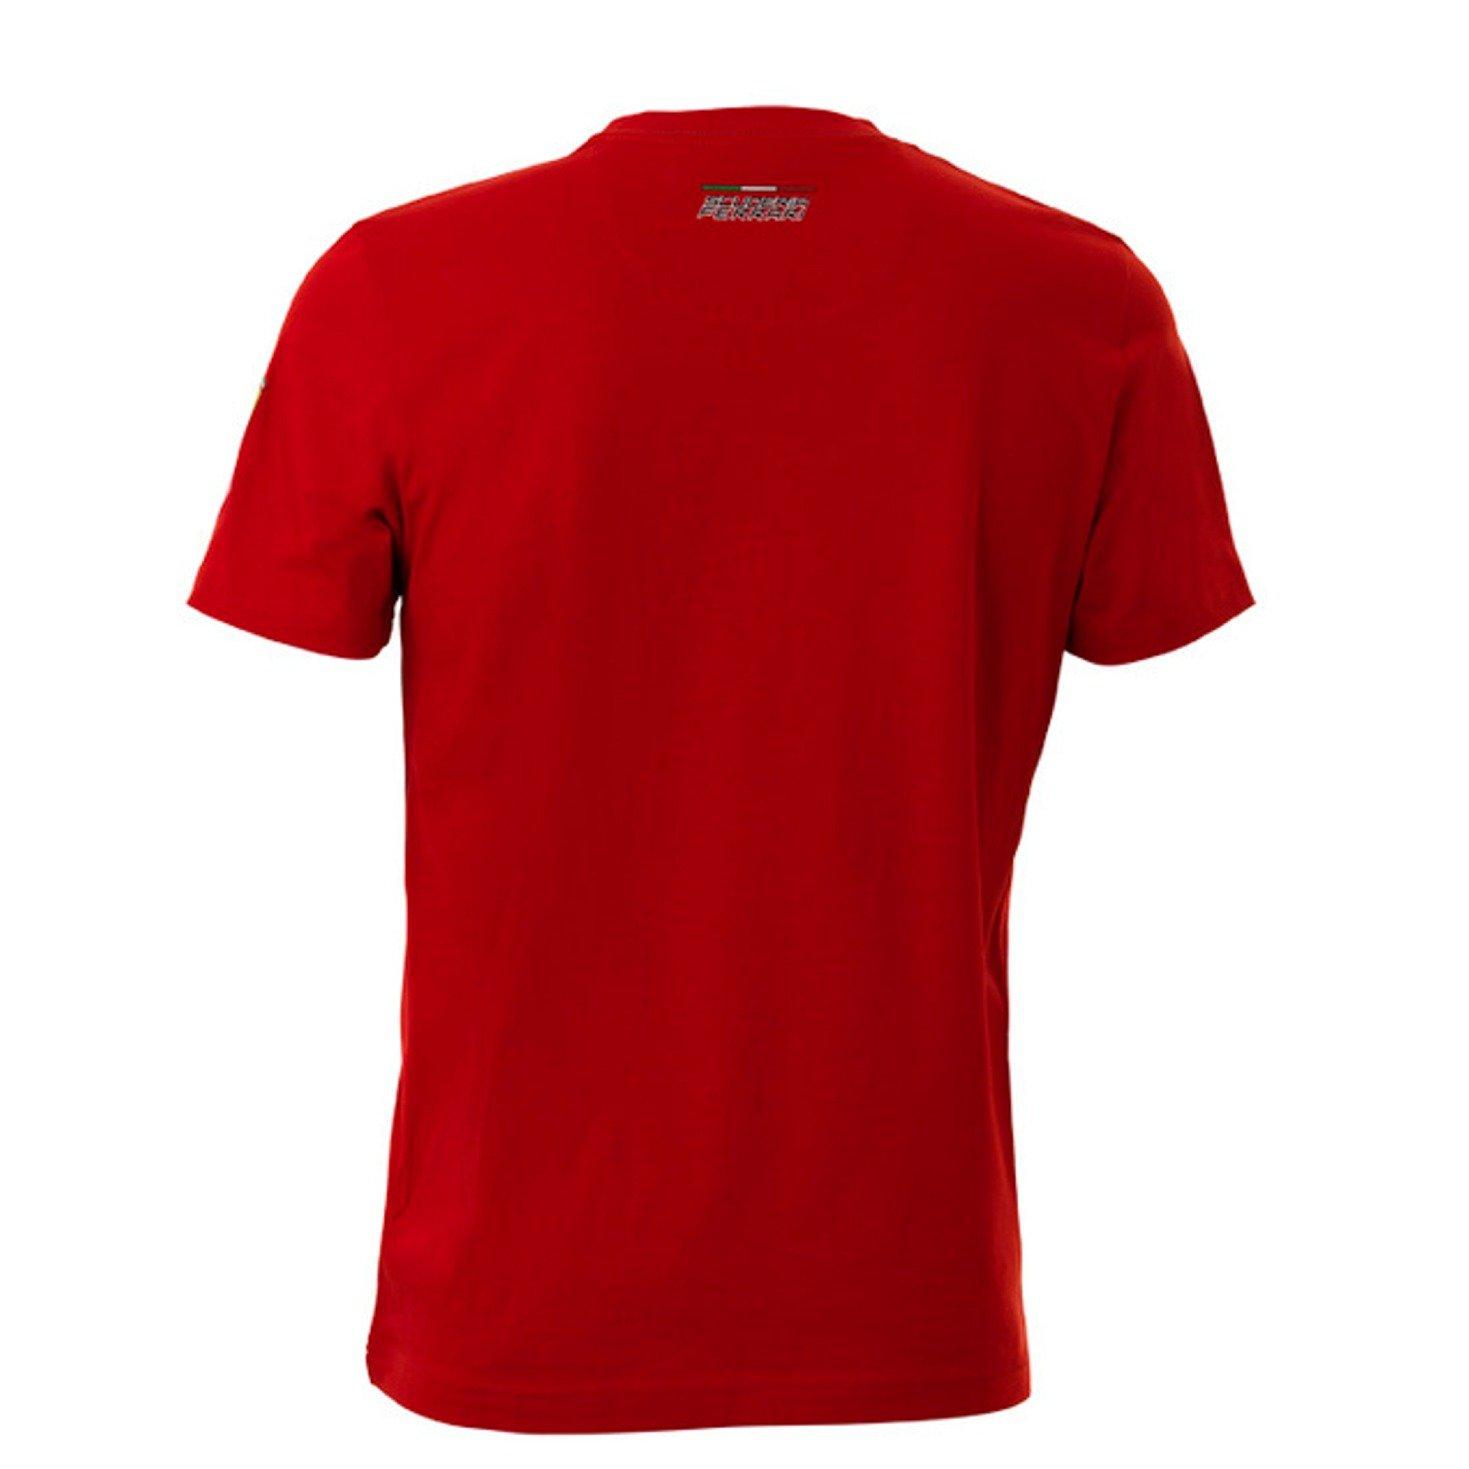 Camiseta Scuderia Ferrari F1 circuito de Fiorano, para hombre, en ...